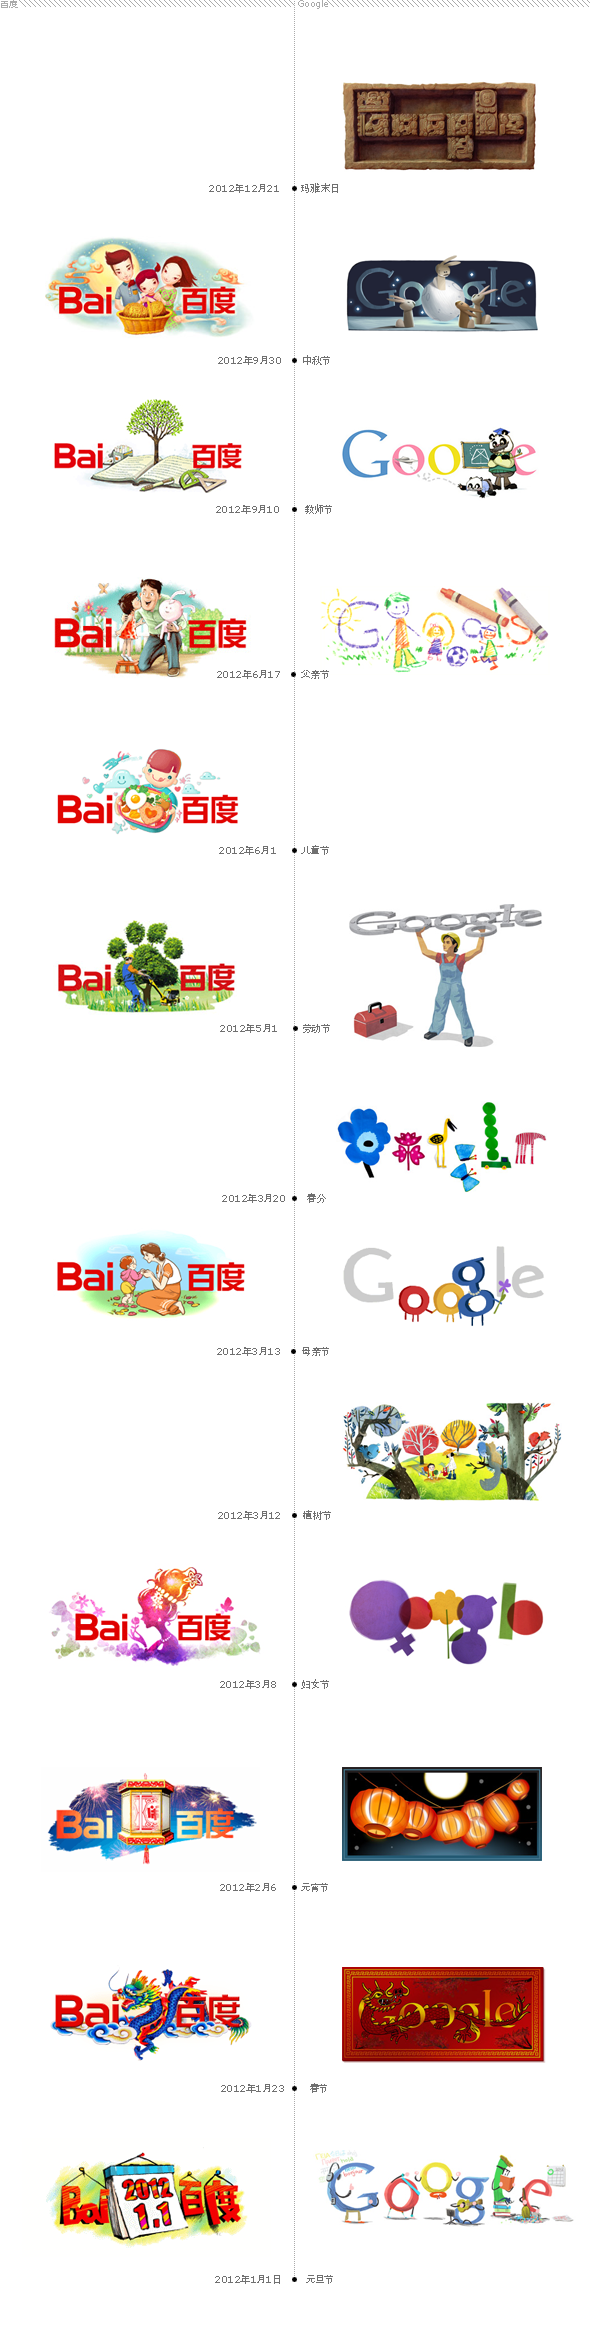 2012 baidu google logo